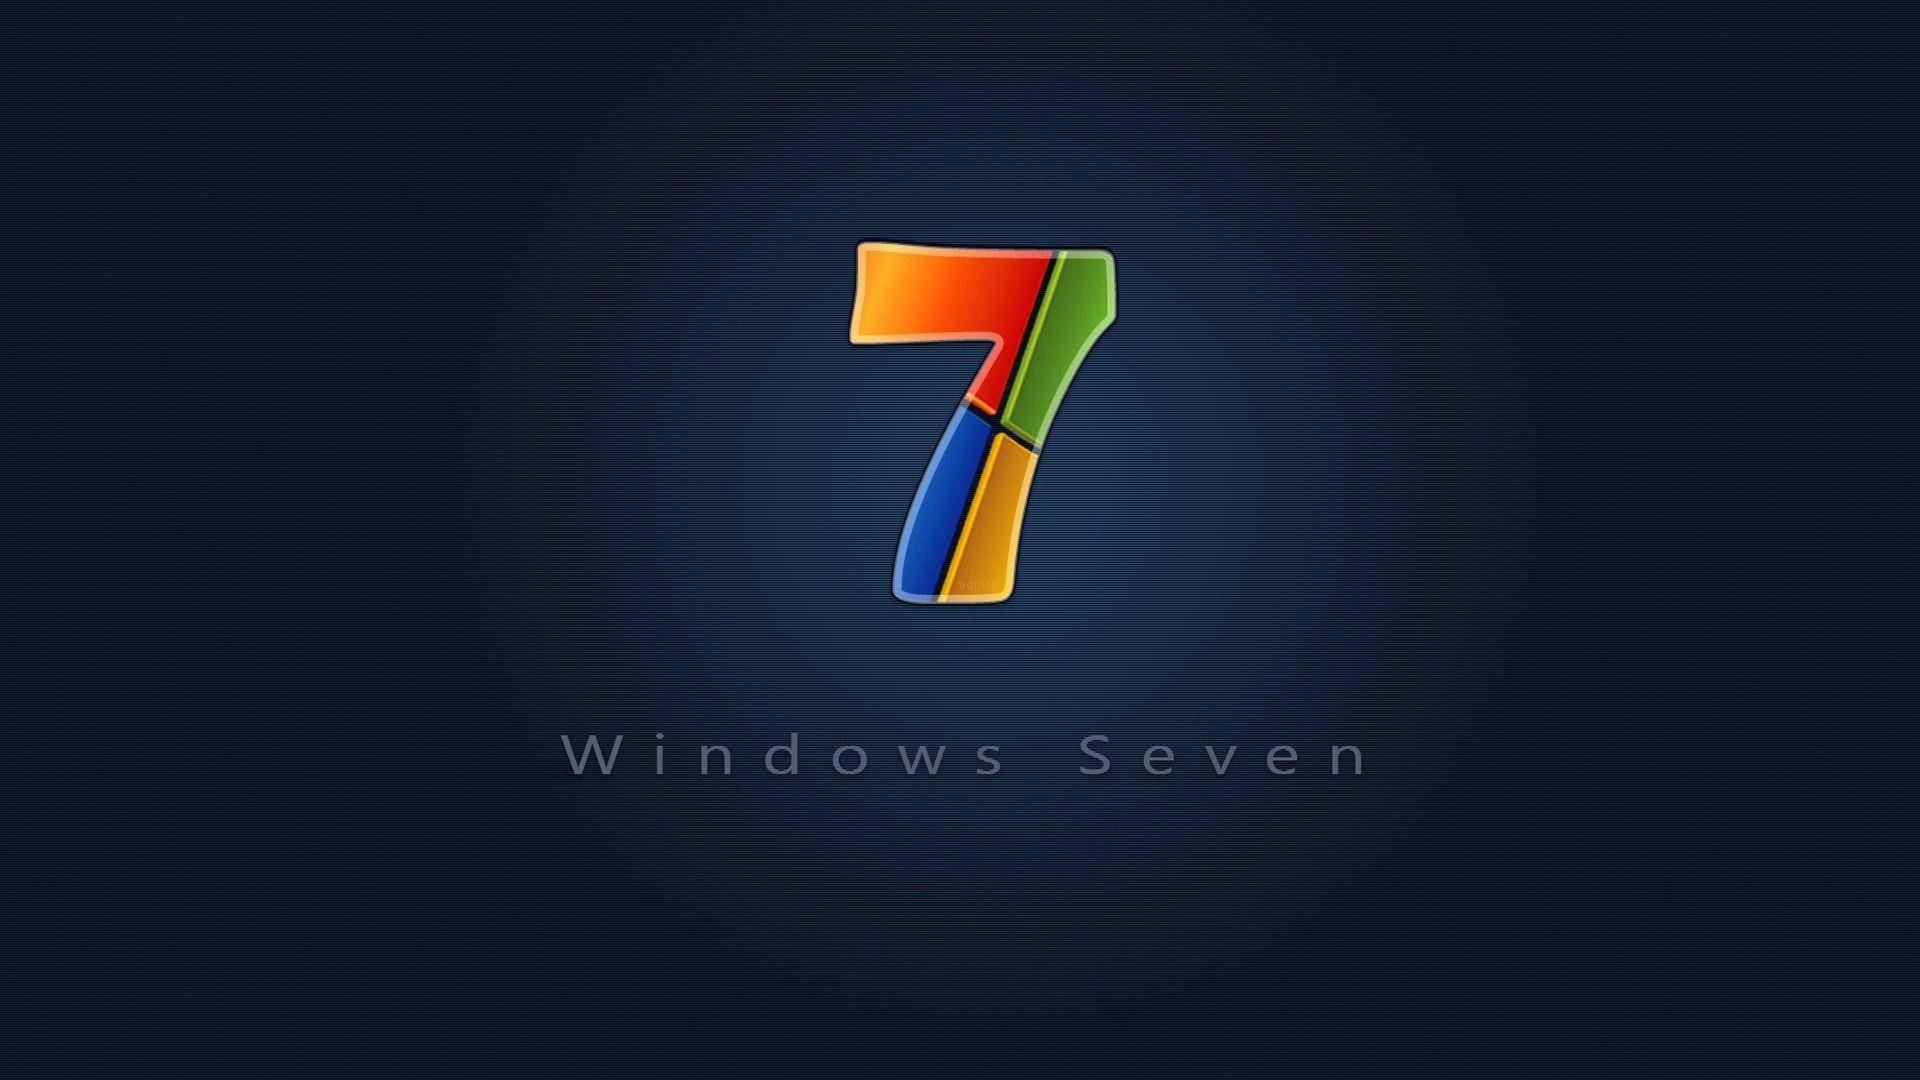 Full HD 1080p Windows 7 Wallpapers HD, Desktop Backgrounds 1920×1080